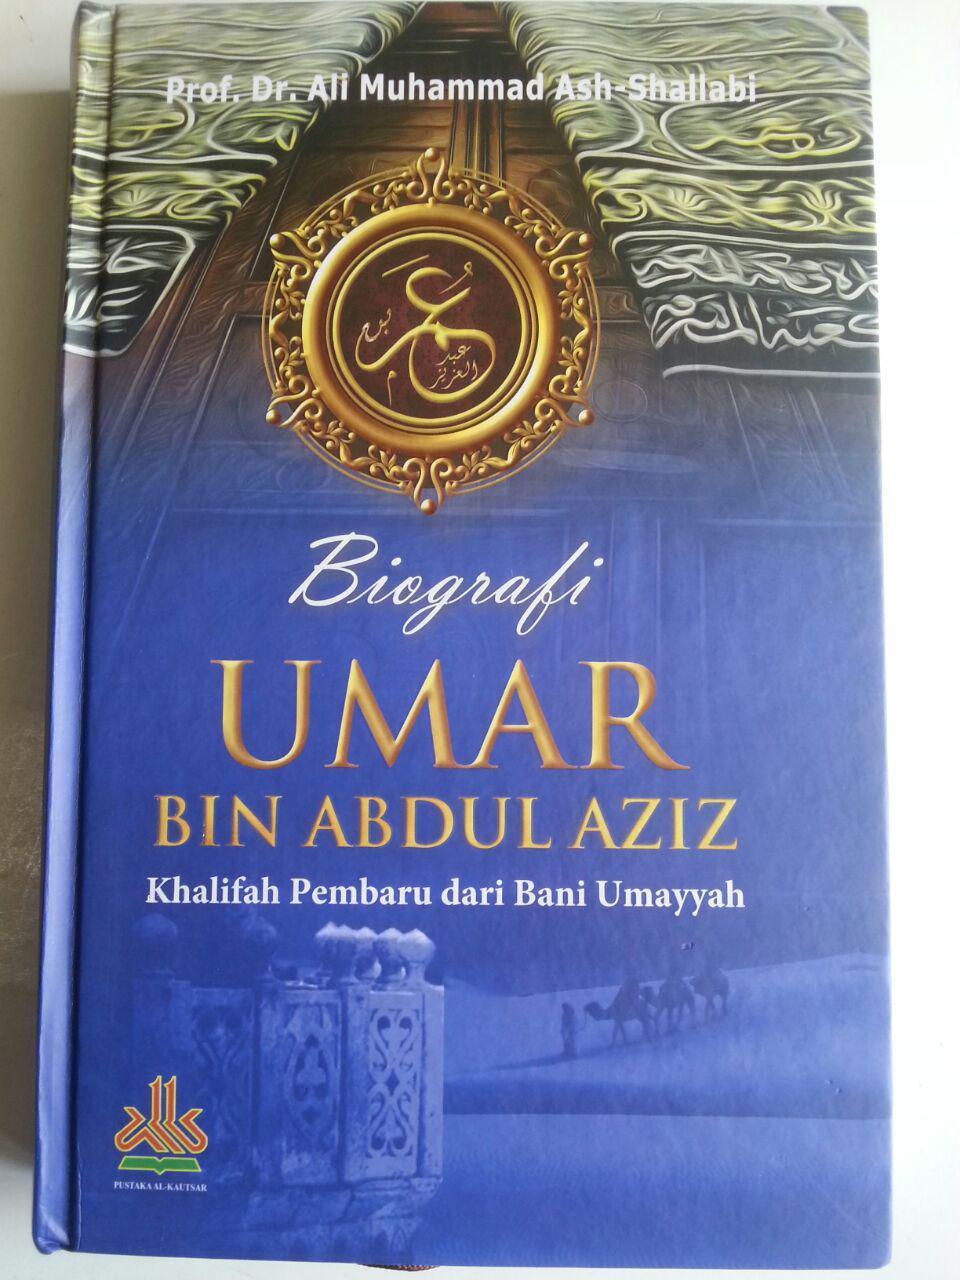 Buku Umar bin Abdul Aziz Khalifah Pembaru Dari Bani Umayyah cover 2